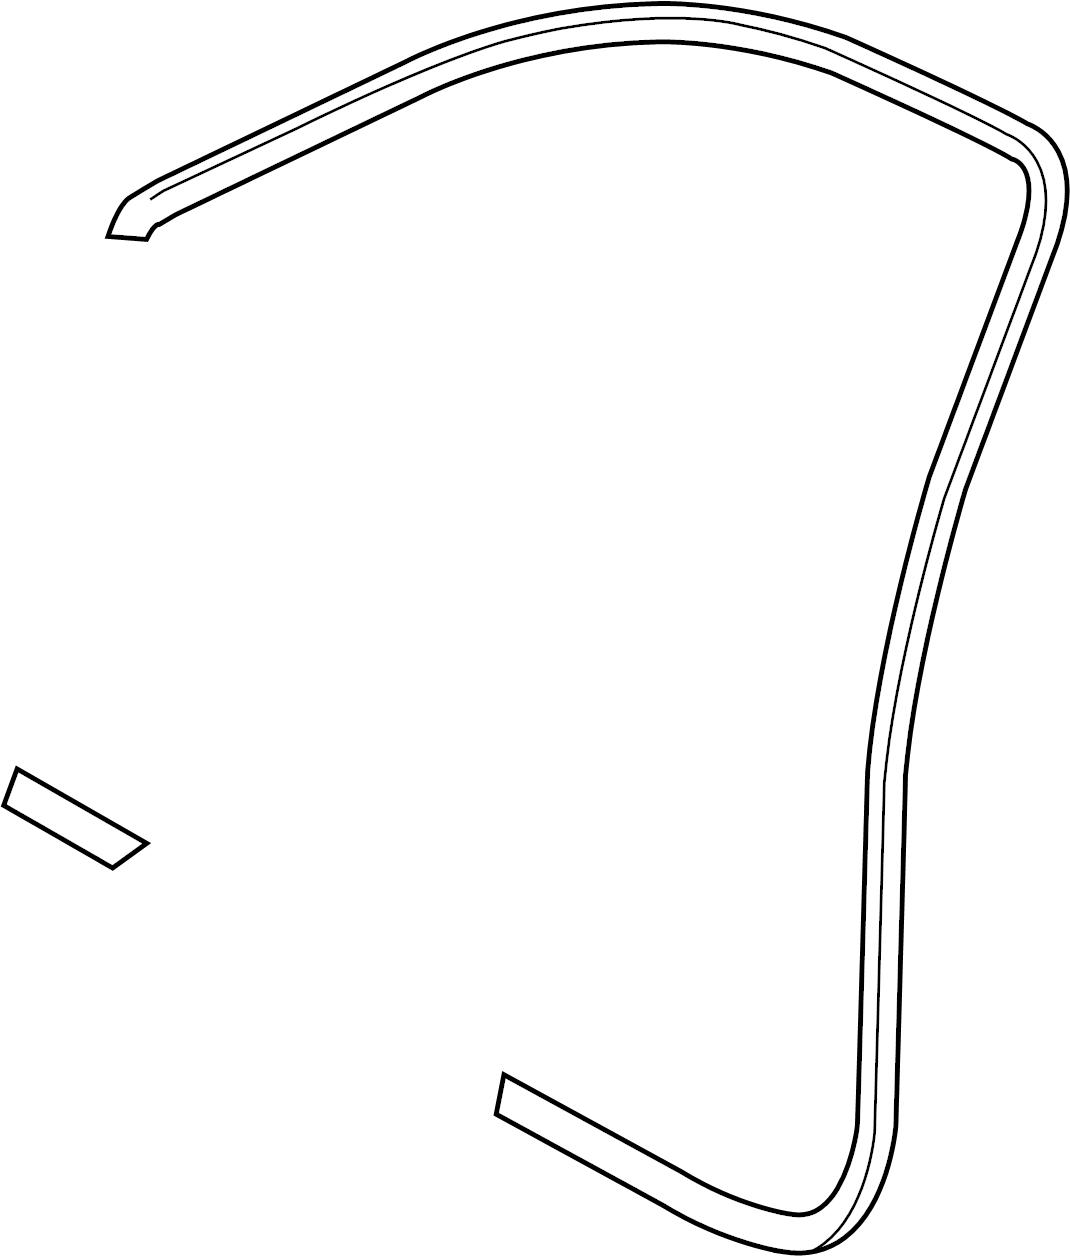 2008 Audi A3 Door Seal. Black, Weatherstrip, Surround